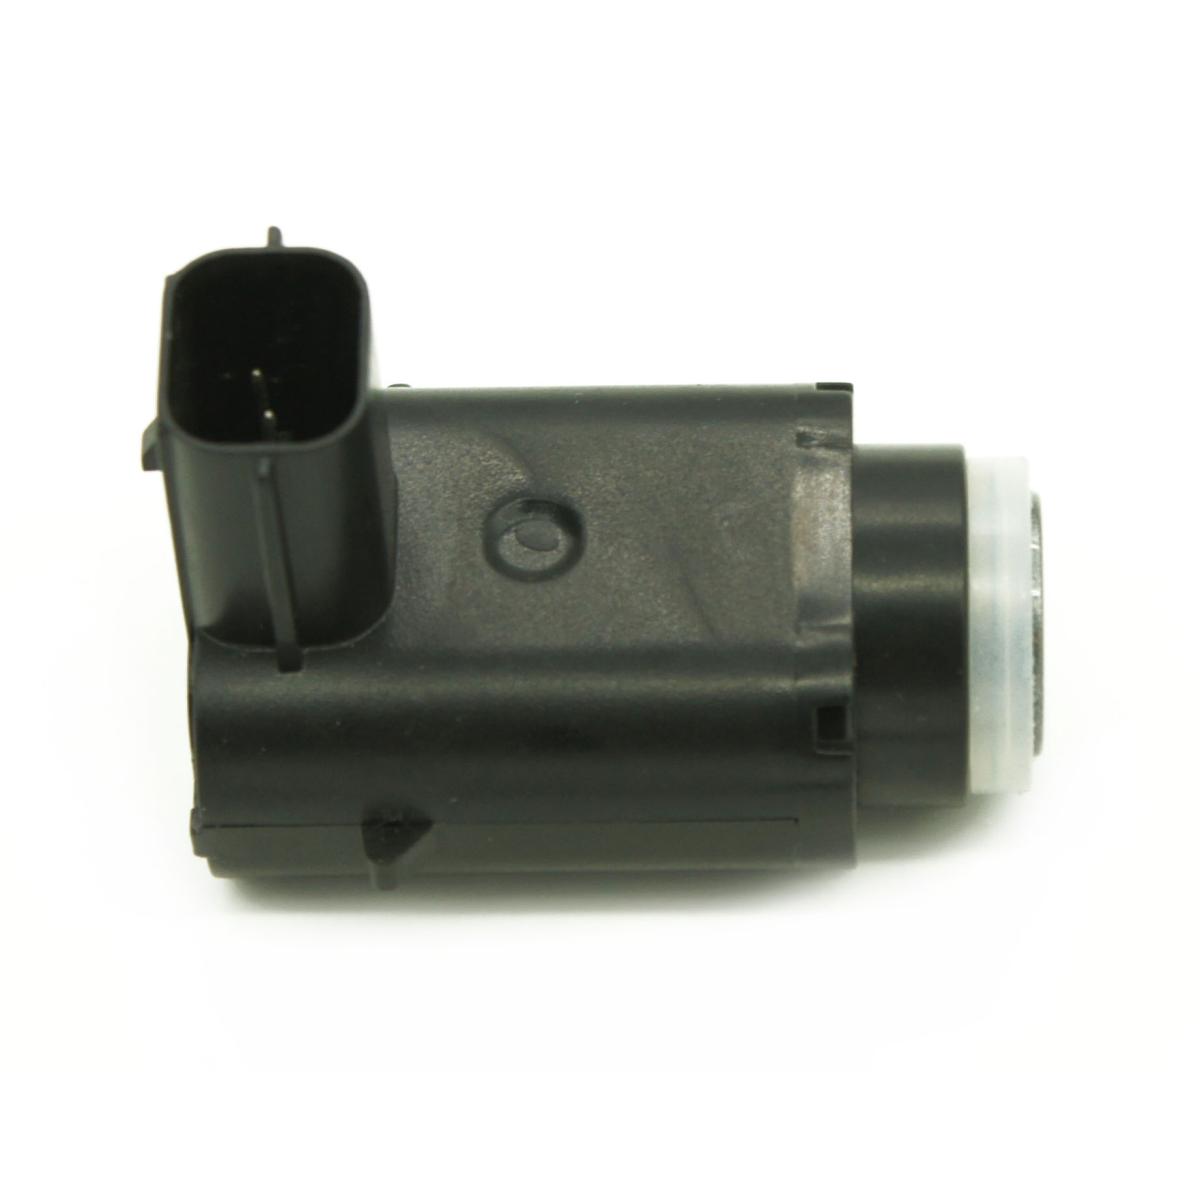 Parktronic PDC Parking Sensor 25955155 for Buick